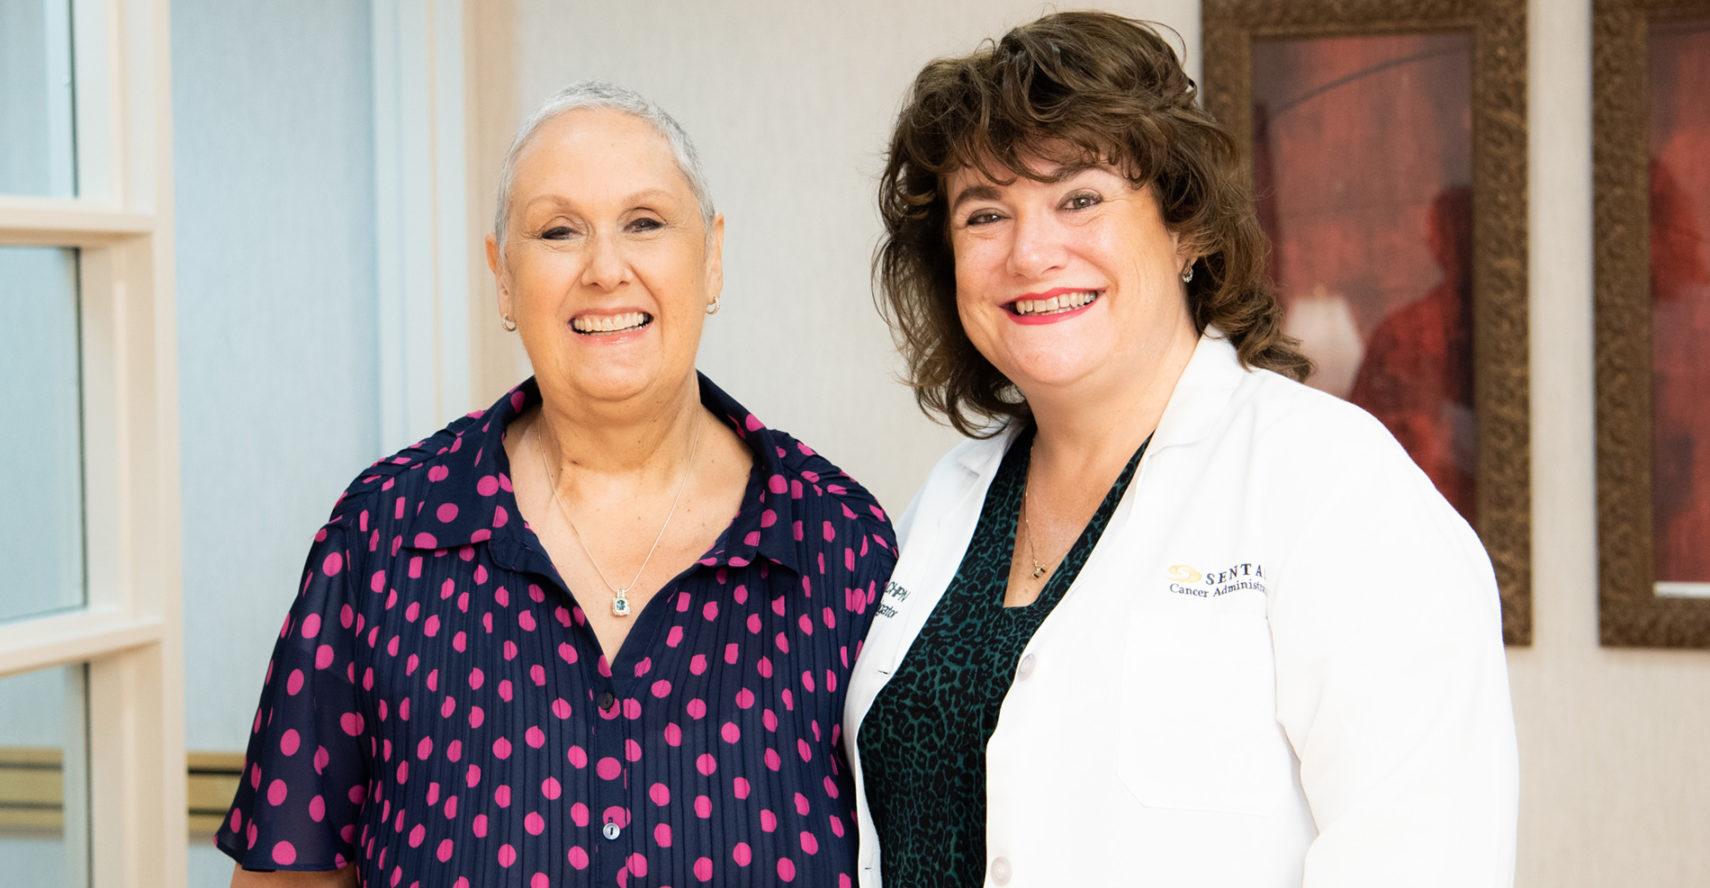 Two women smiling | Kathy Baxter